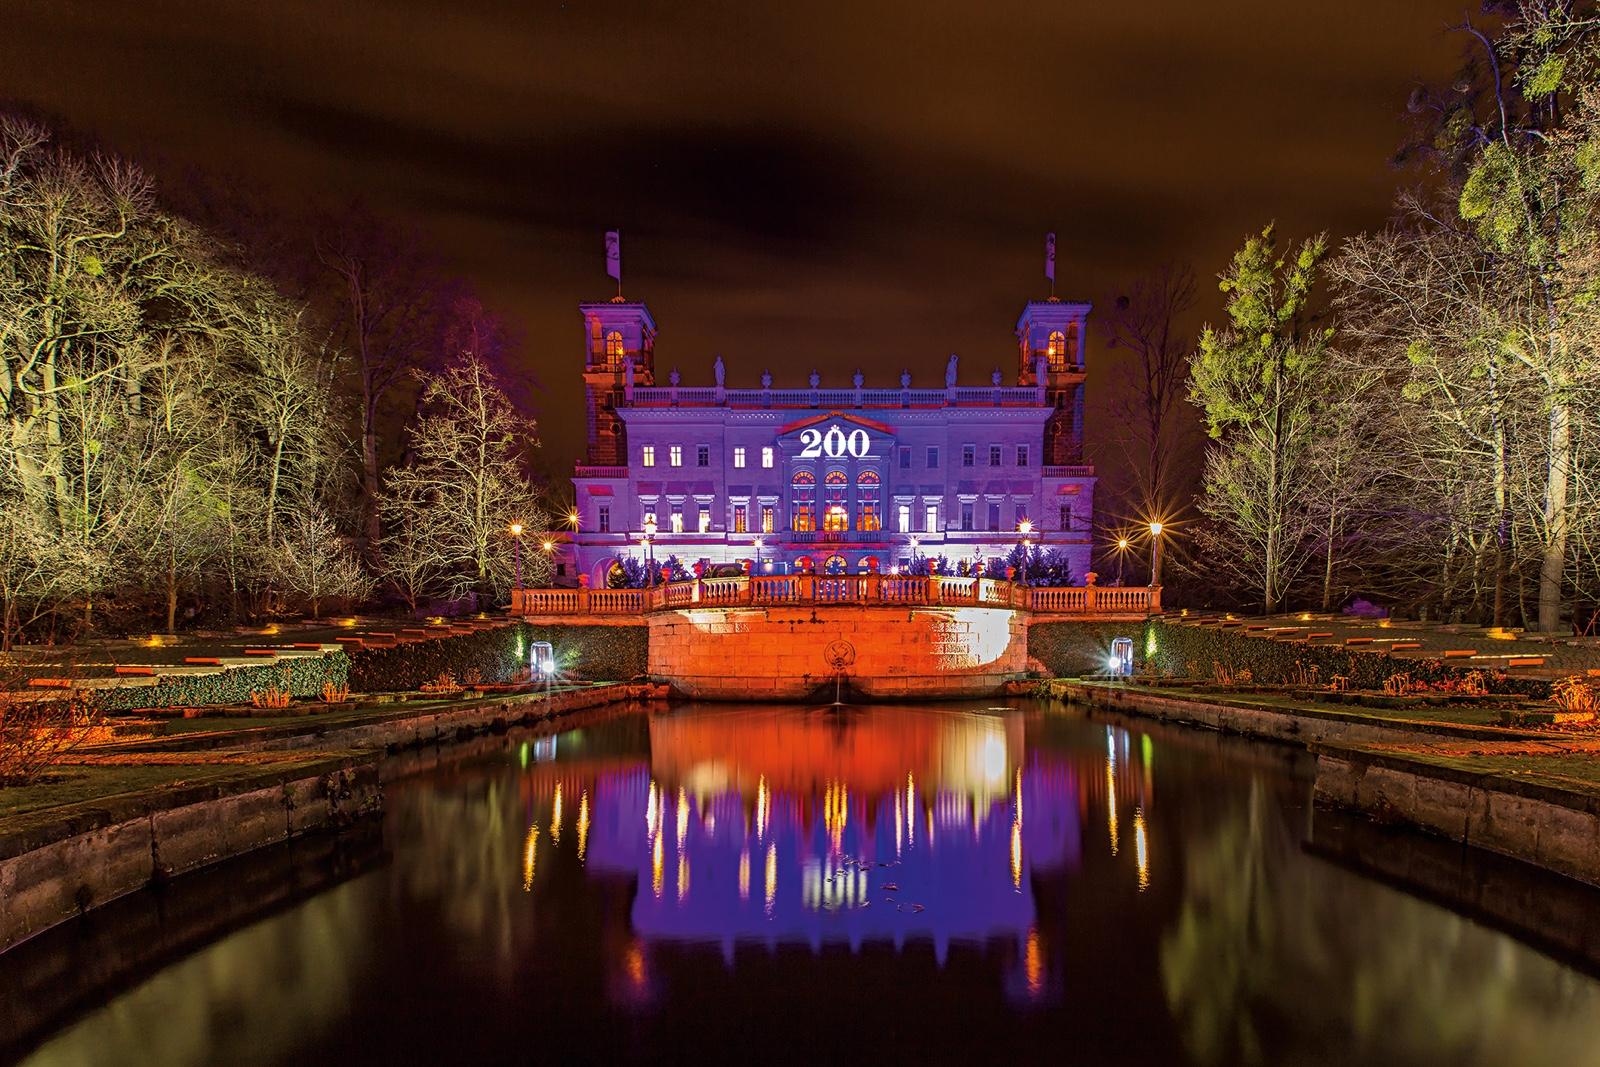 200 Aniversario F A Lange Albrechtsberg